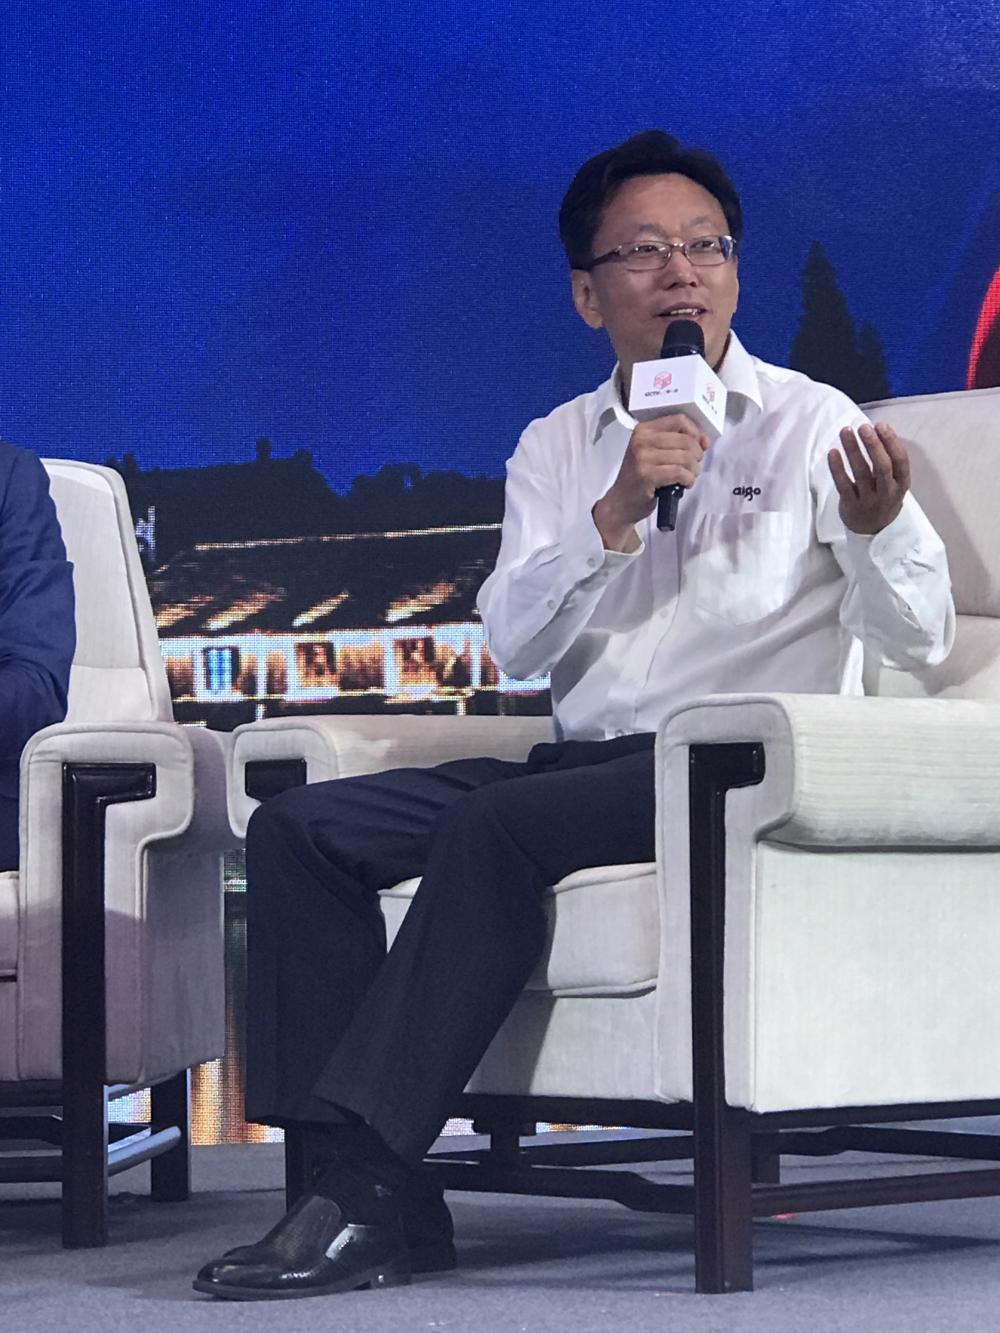 CCTV一镇一品高峰论坛 爱国者姜钧凯签约品牌合作